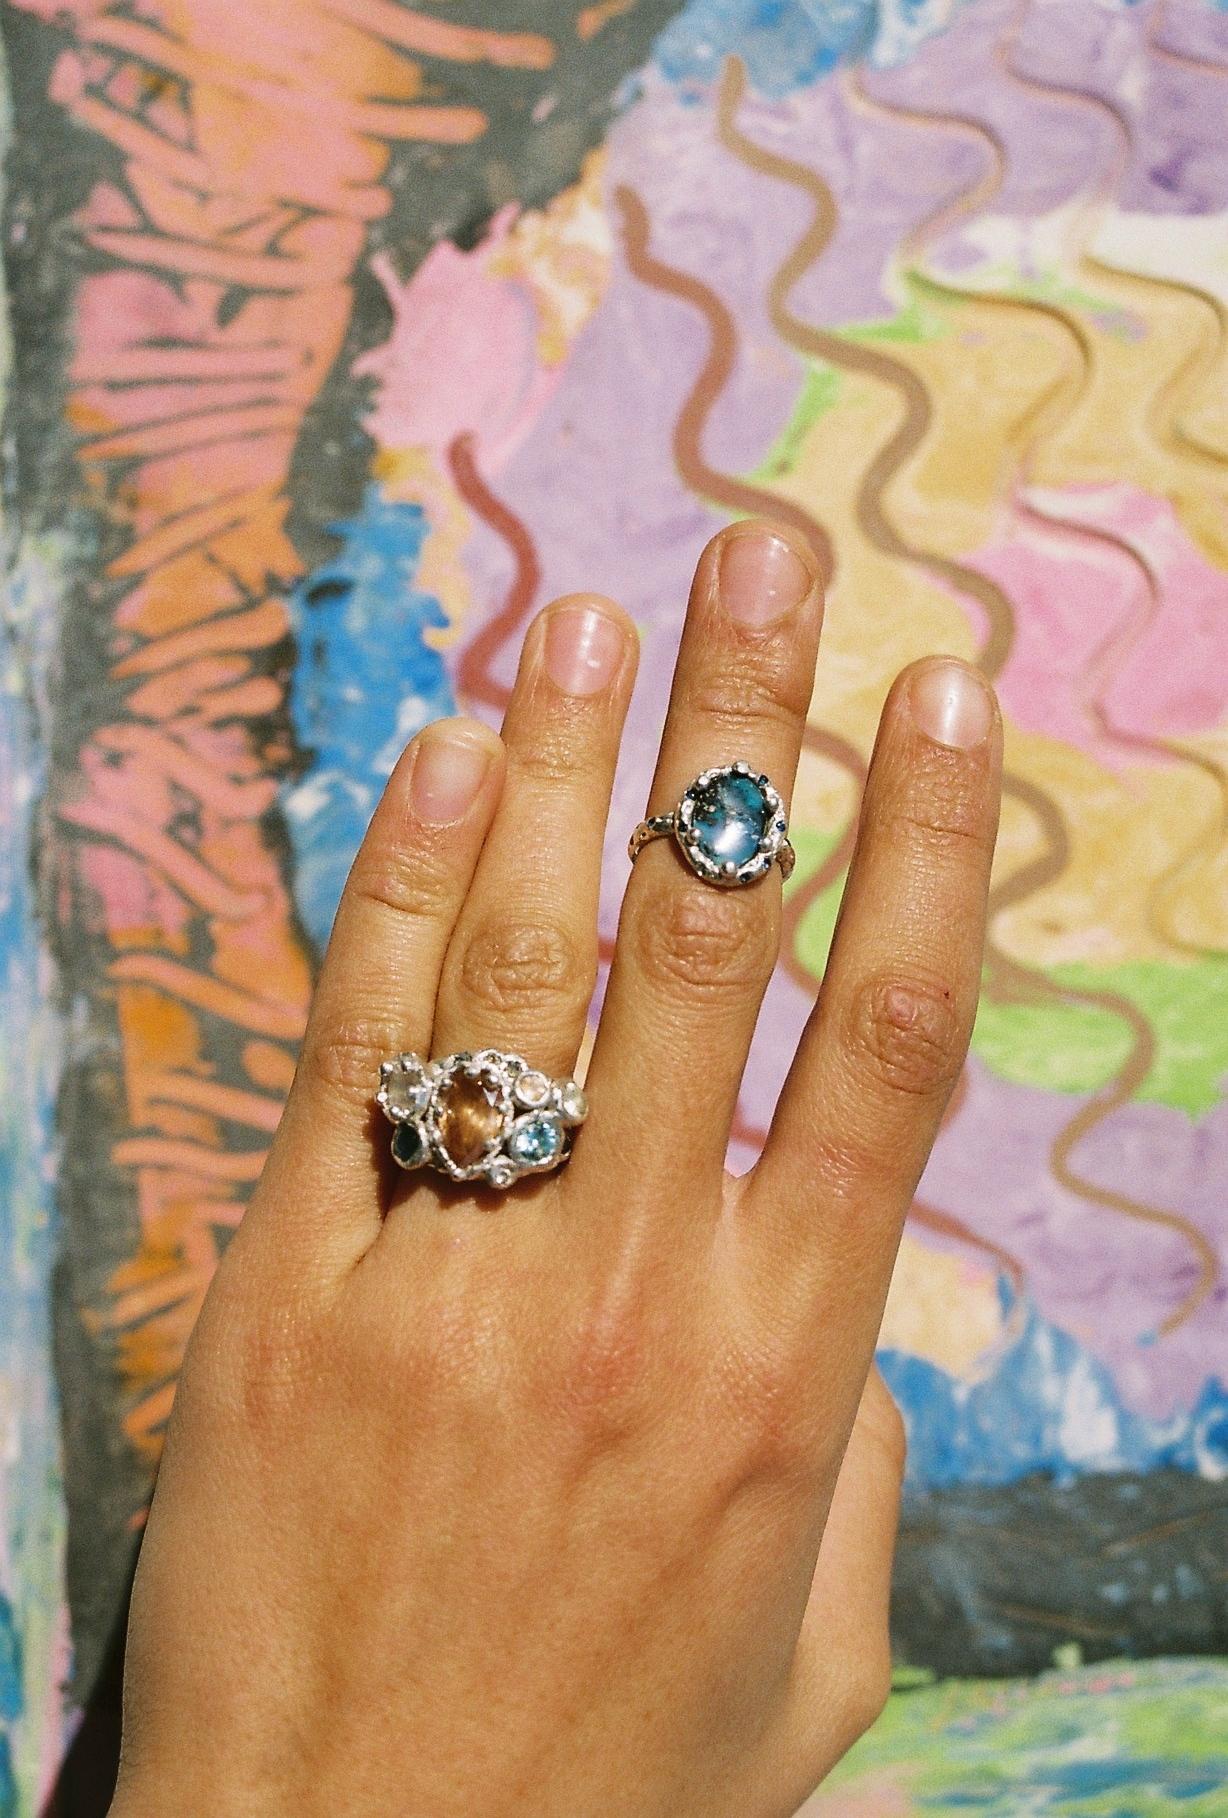 ada-hodgson-silver-gold-contemporary-australian-jewellery-designer-jeweller-design-handmade-mebourne-custom-engagement-wedding-enamel-sterling-jewelry-statement-ring-earrings